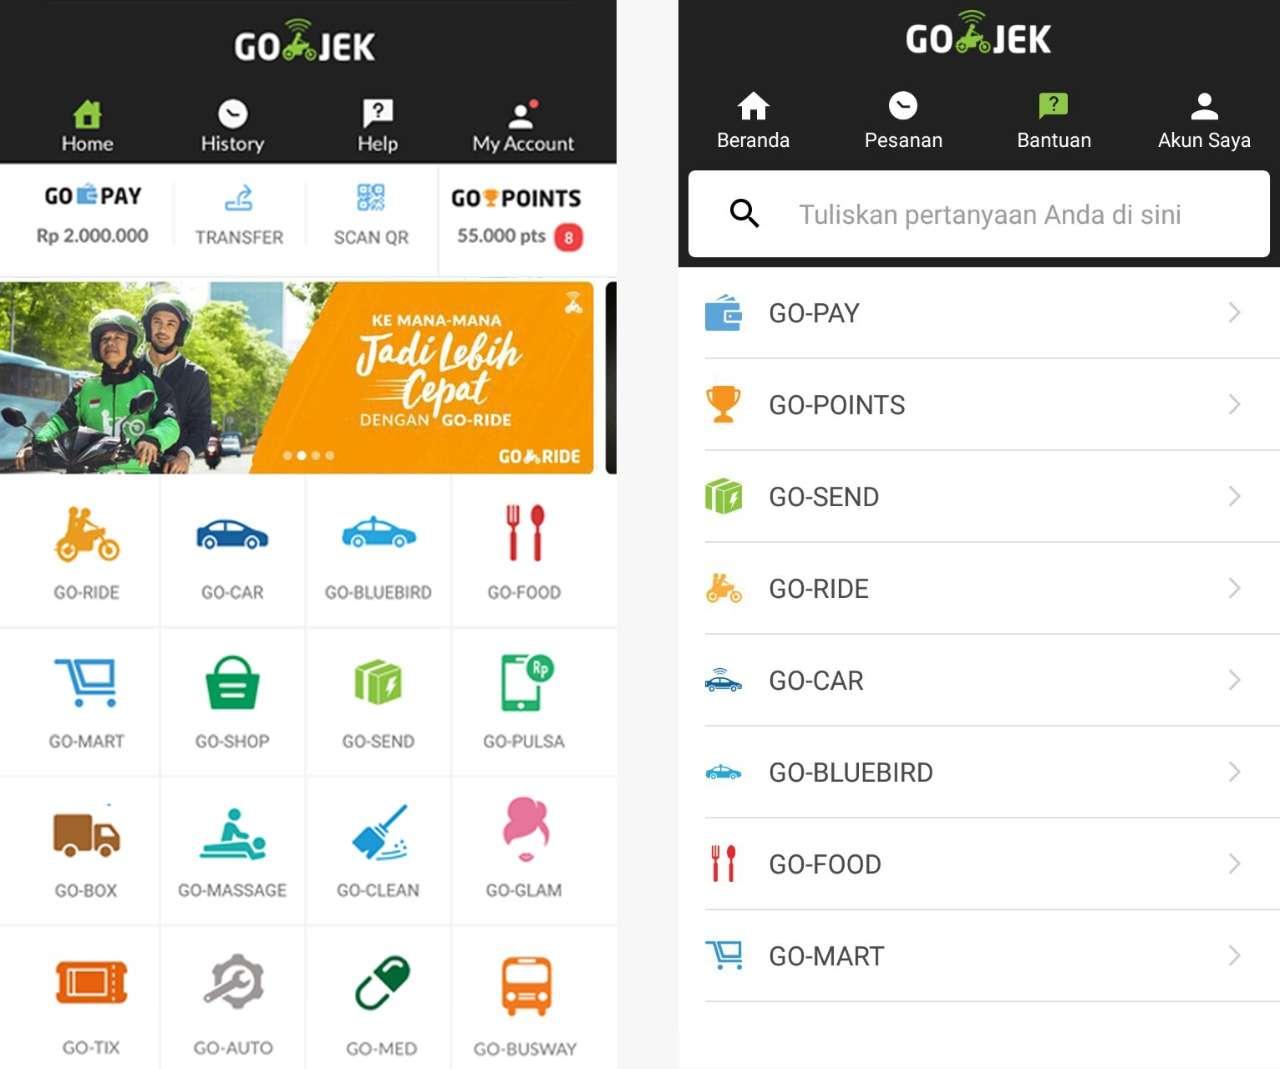 Go Jeck Pay: Begini Cara Pakai Aplikasi Go-Jek Indonesia Di Singapura